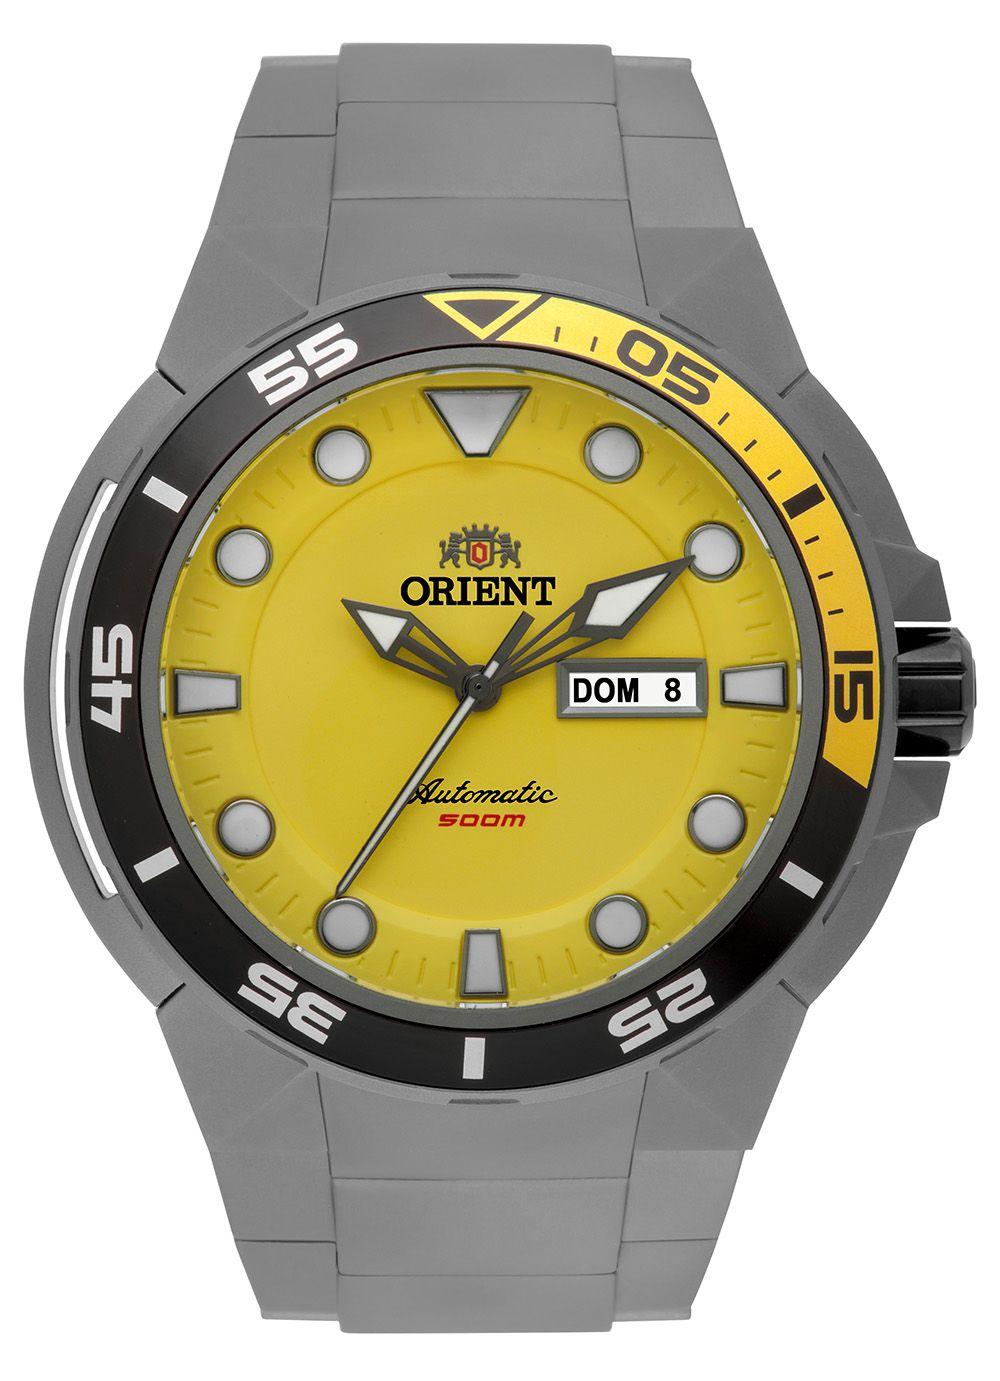 Relógio Masculino Casual Cinza 469TI003-Y1GS Orient